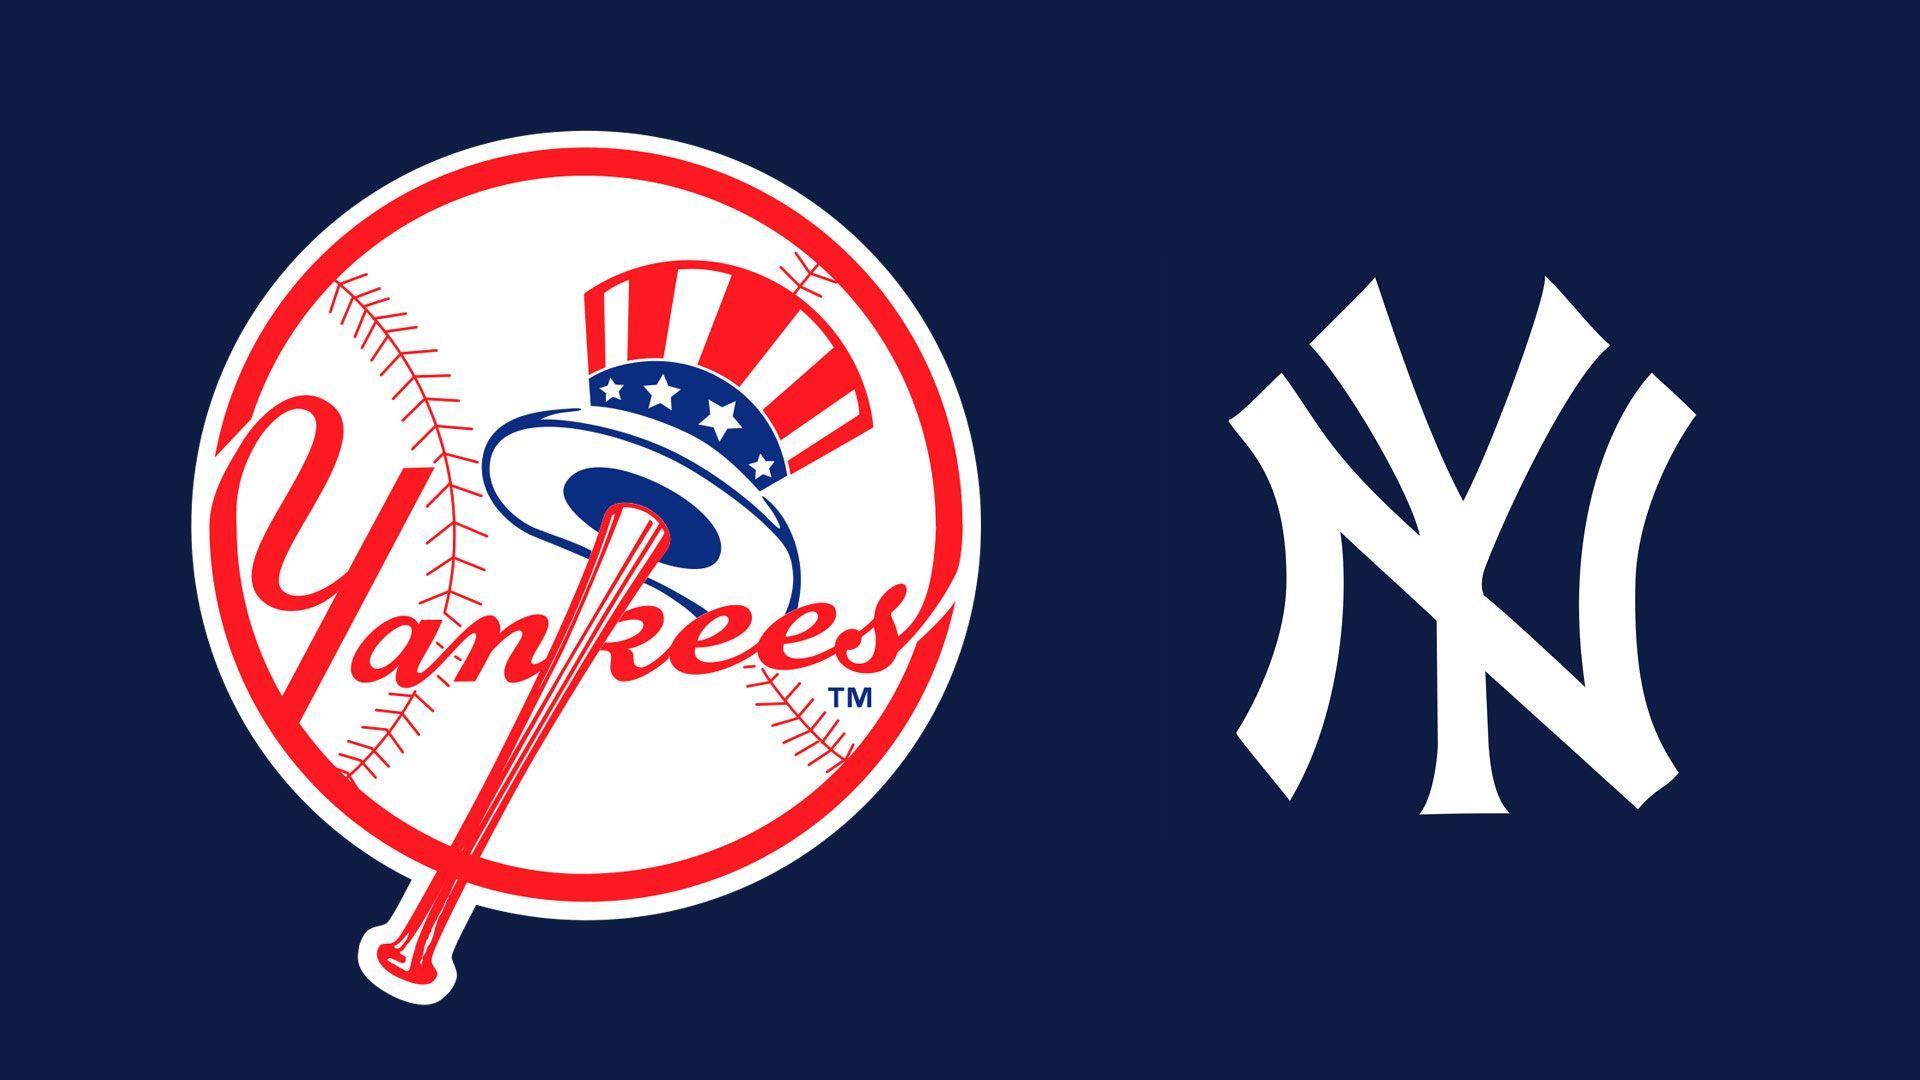 c38b909dd MLB New York Yankees Logo 1920x1080 wallpaper